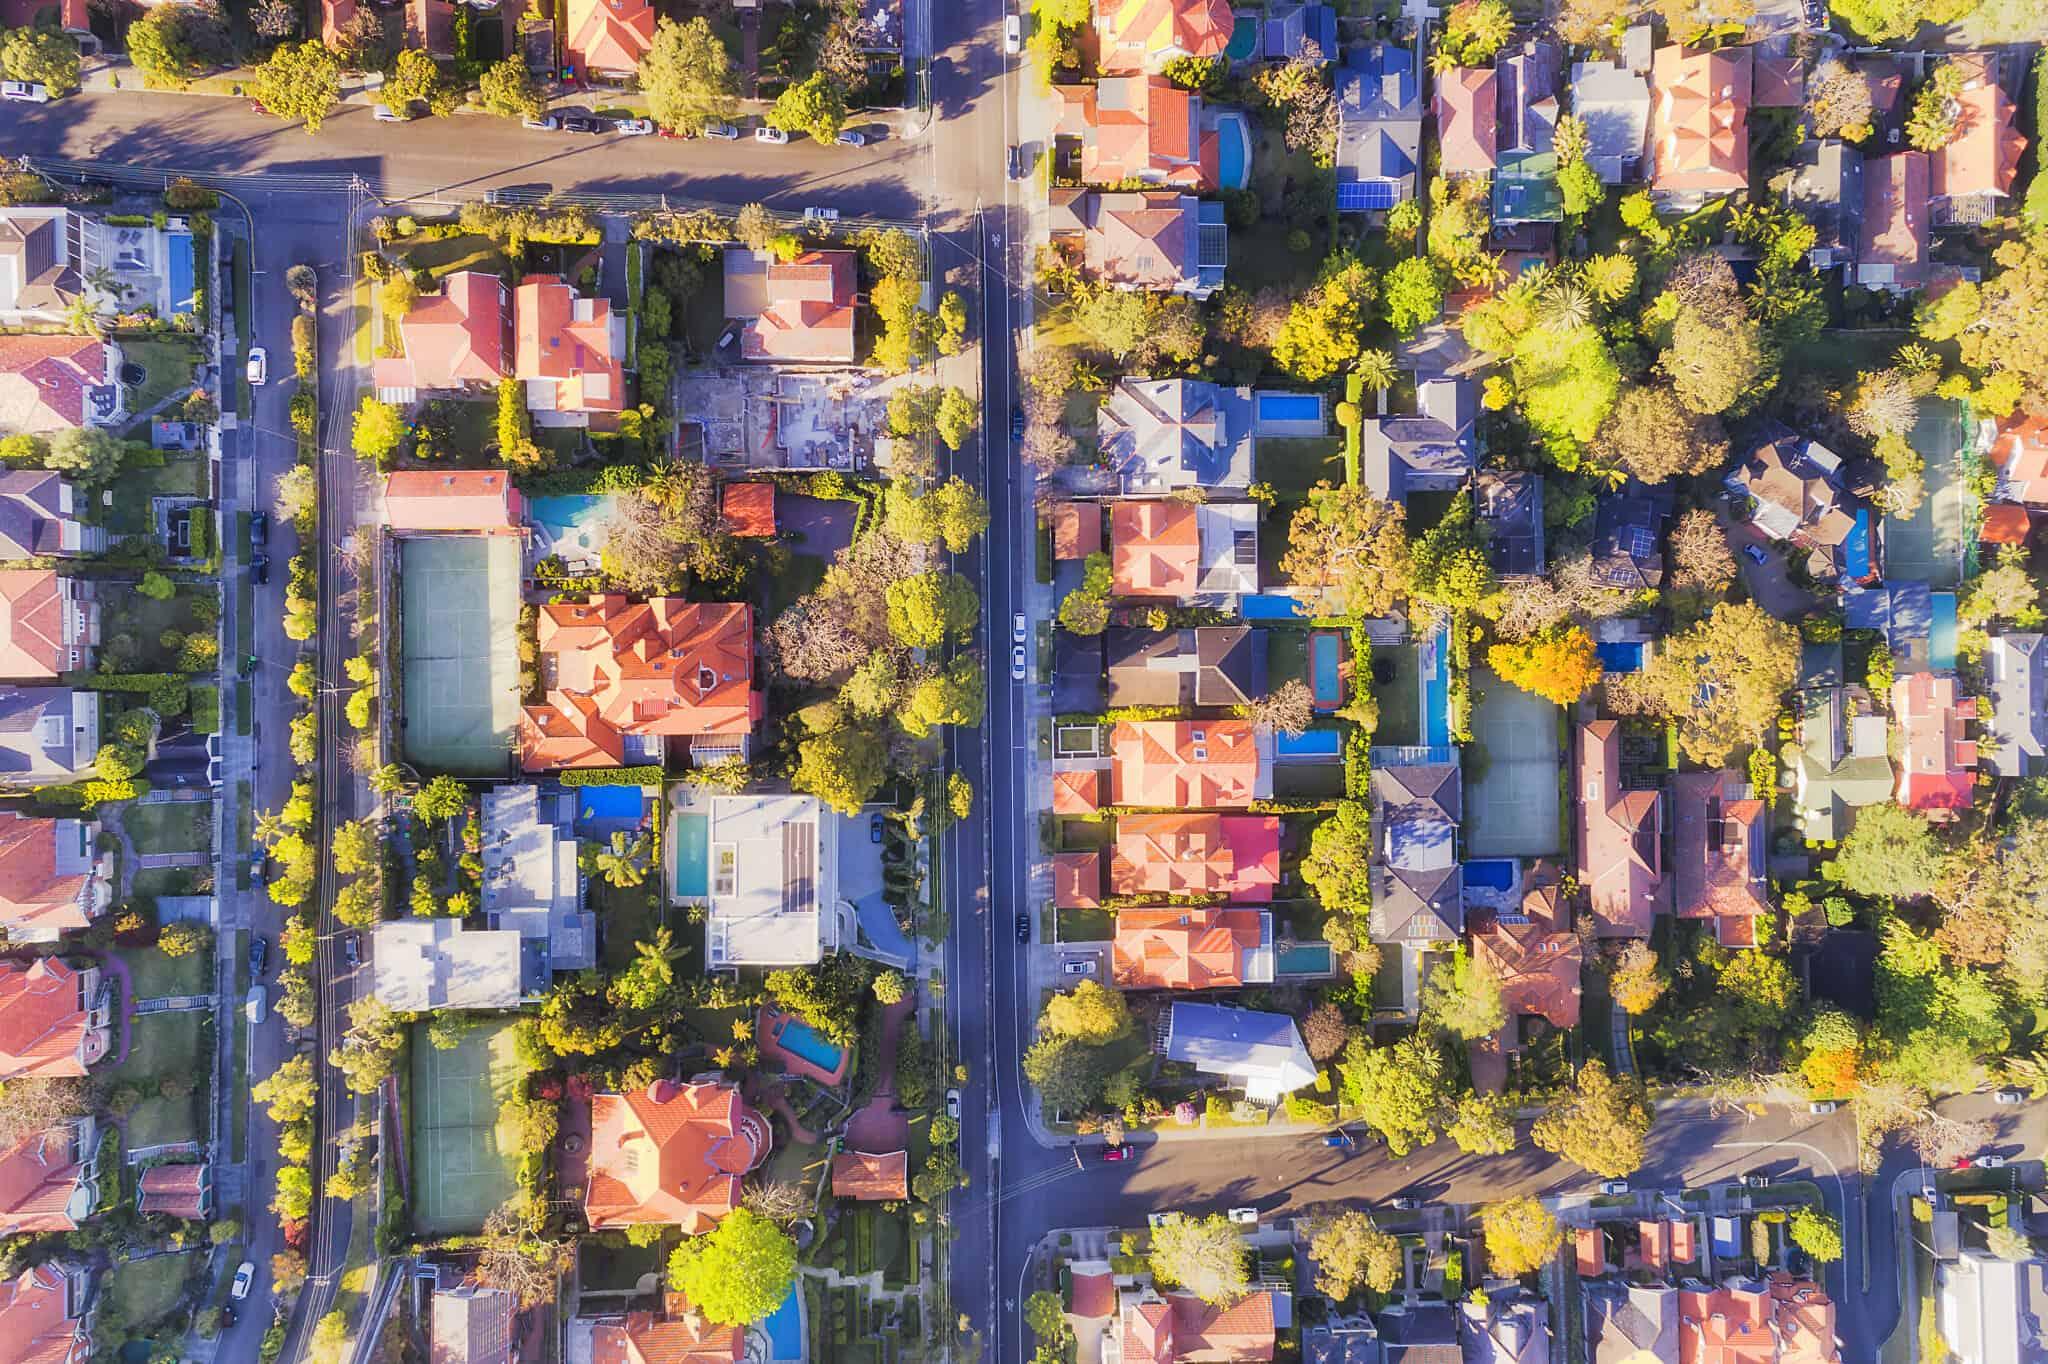 D Mosman Streets Top down (צילום: zetter/iStock)